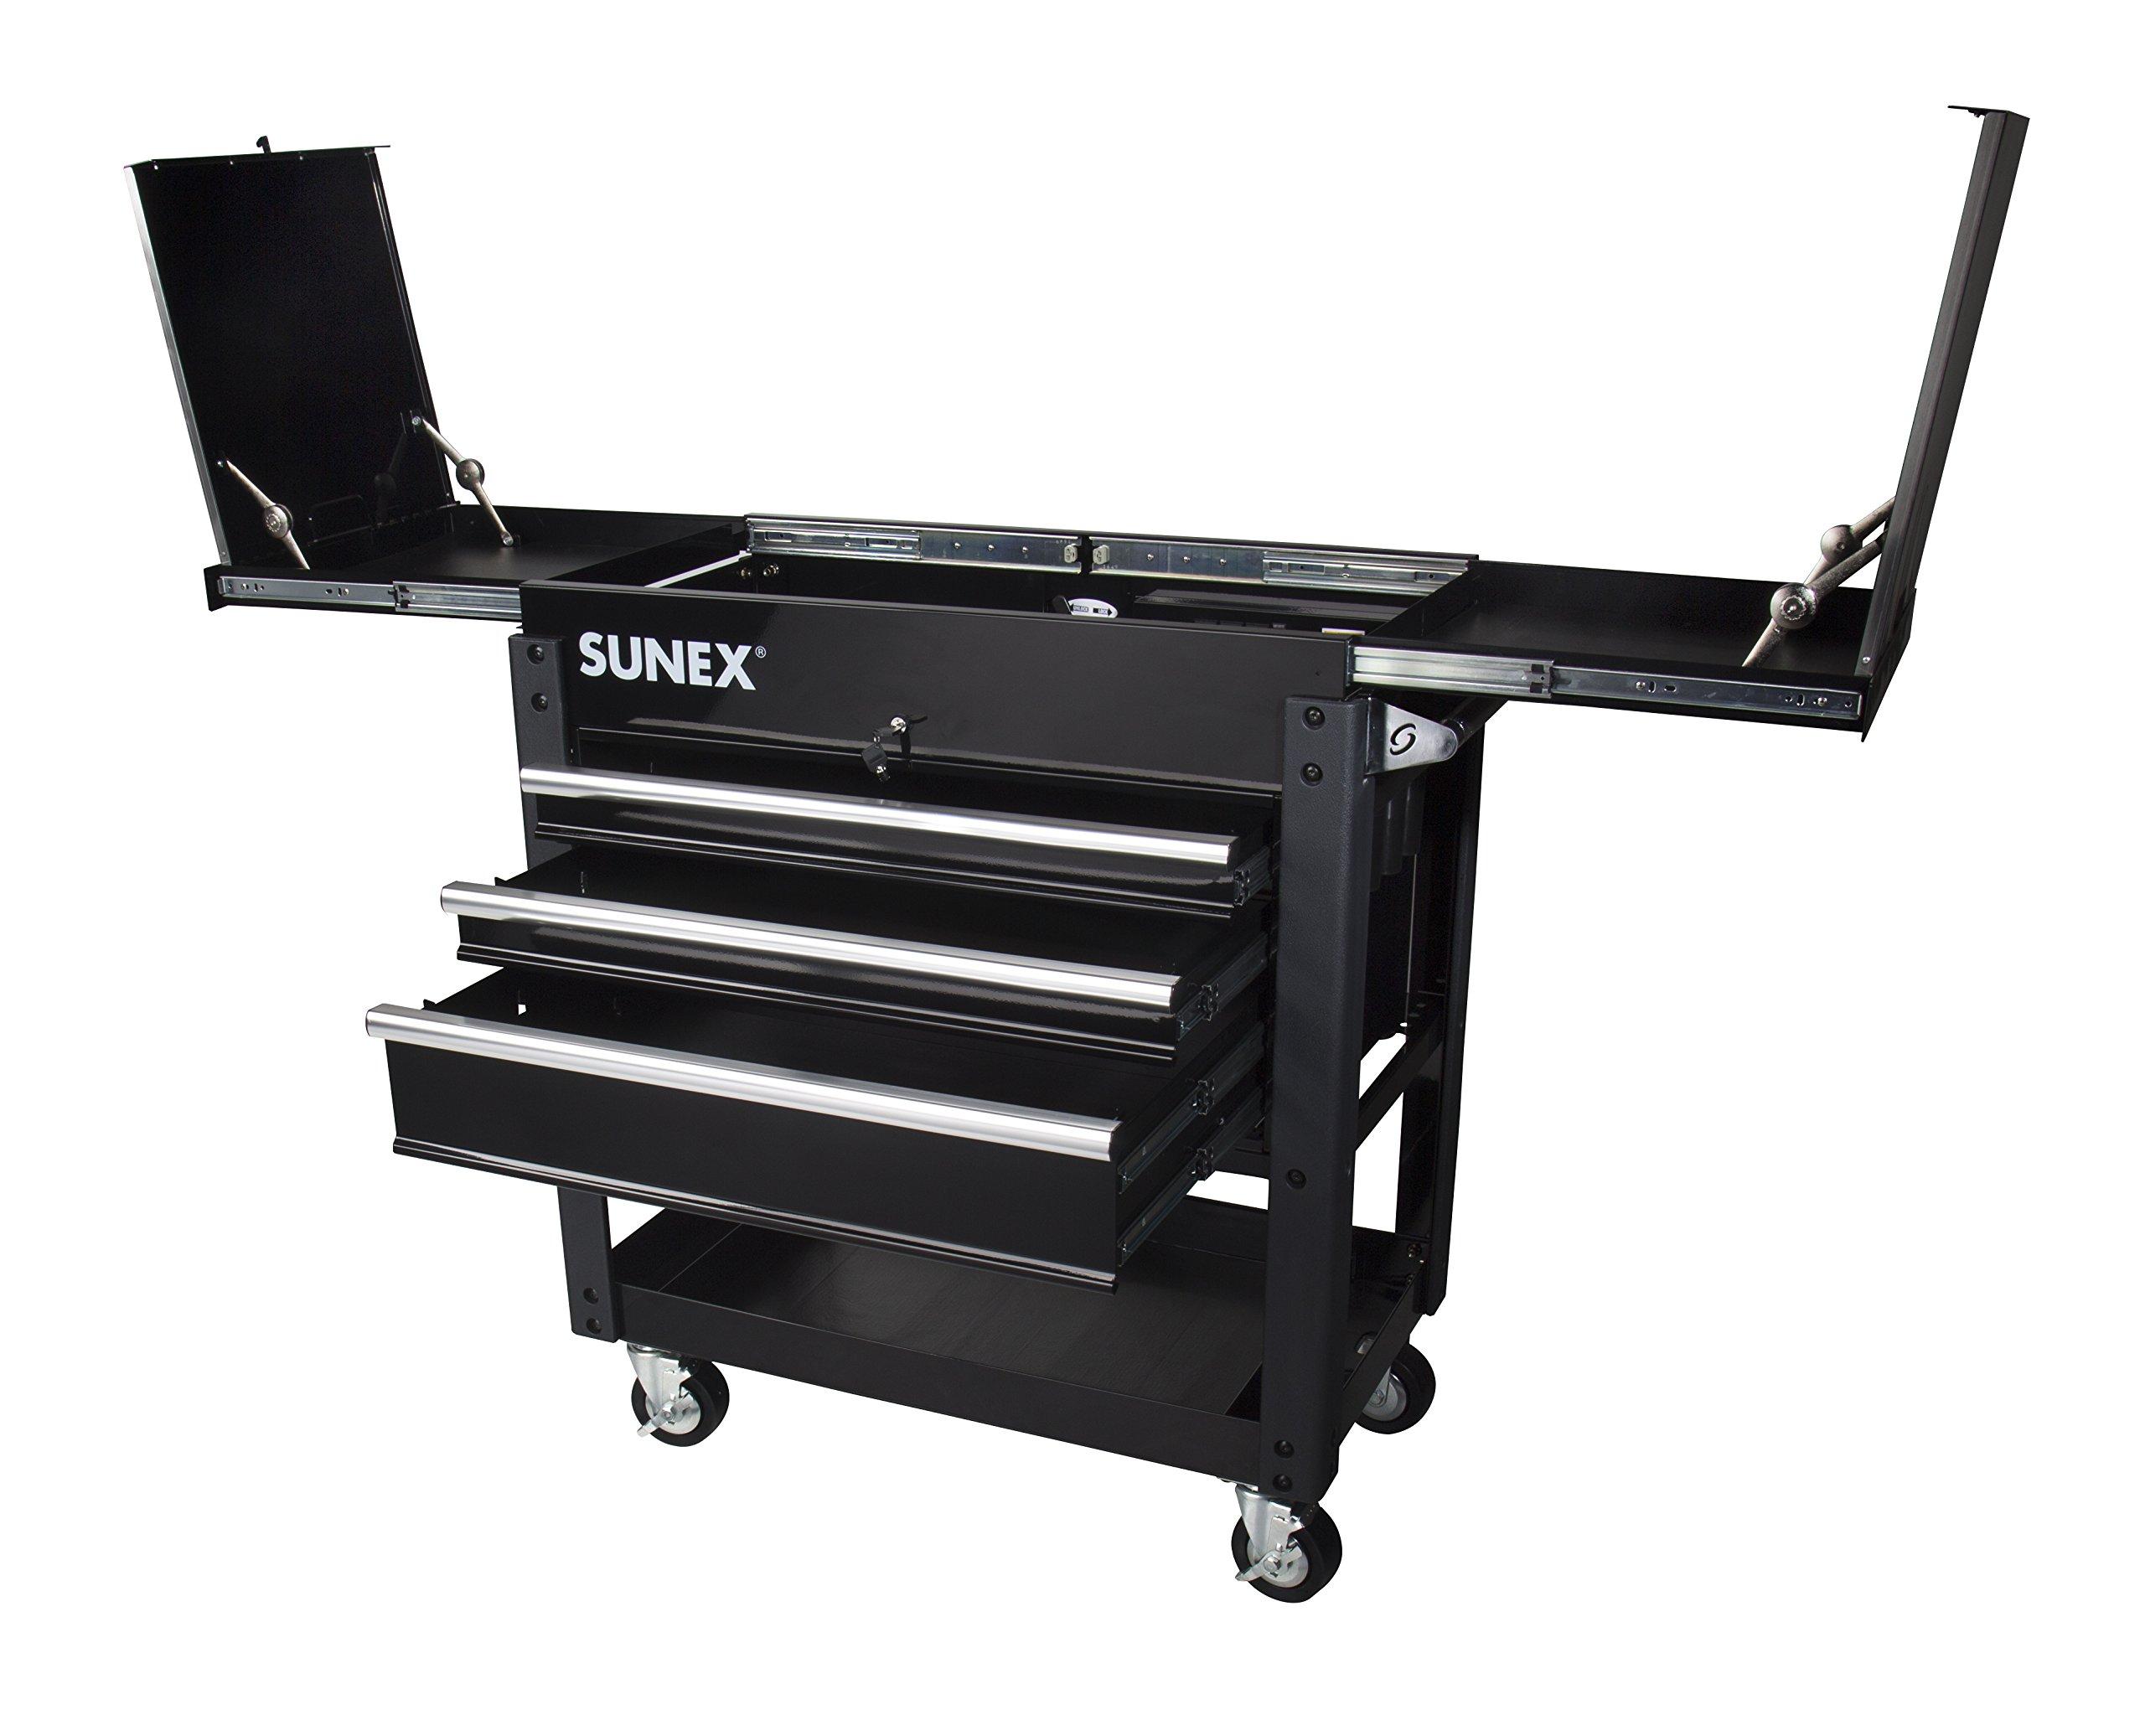 Sunex 8035XTBK 3 Drawer Service Cart with Sliding Top- Black